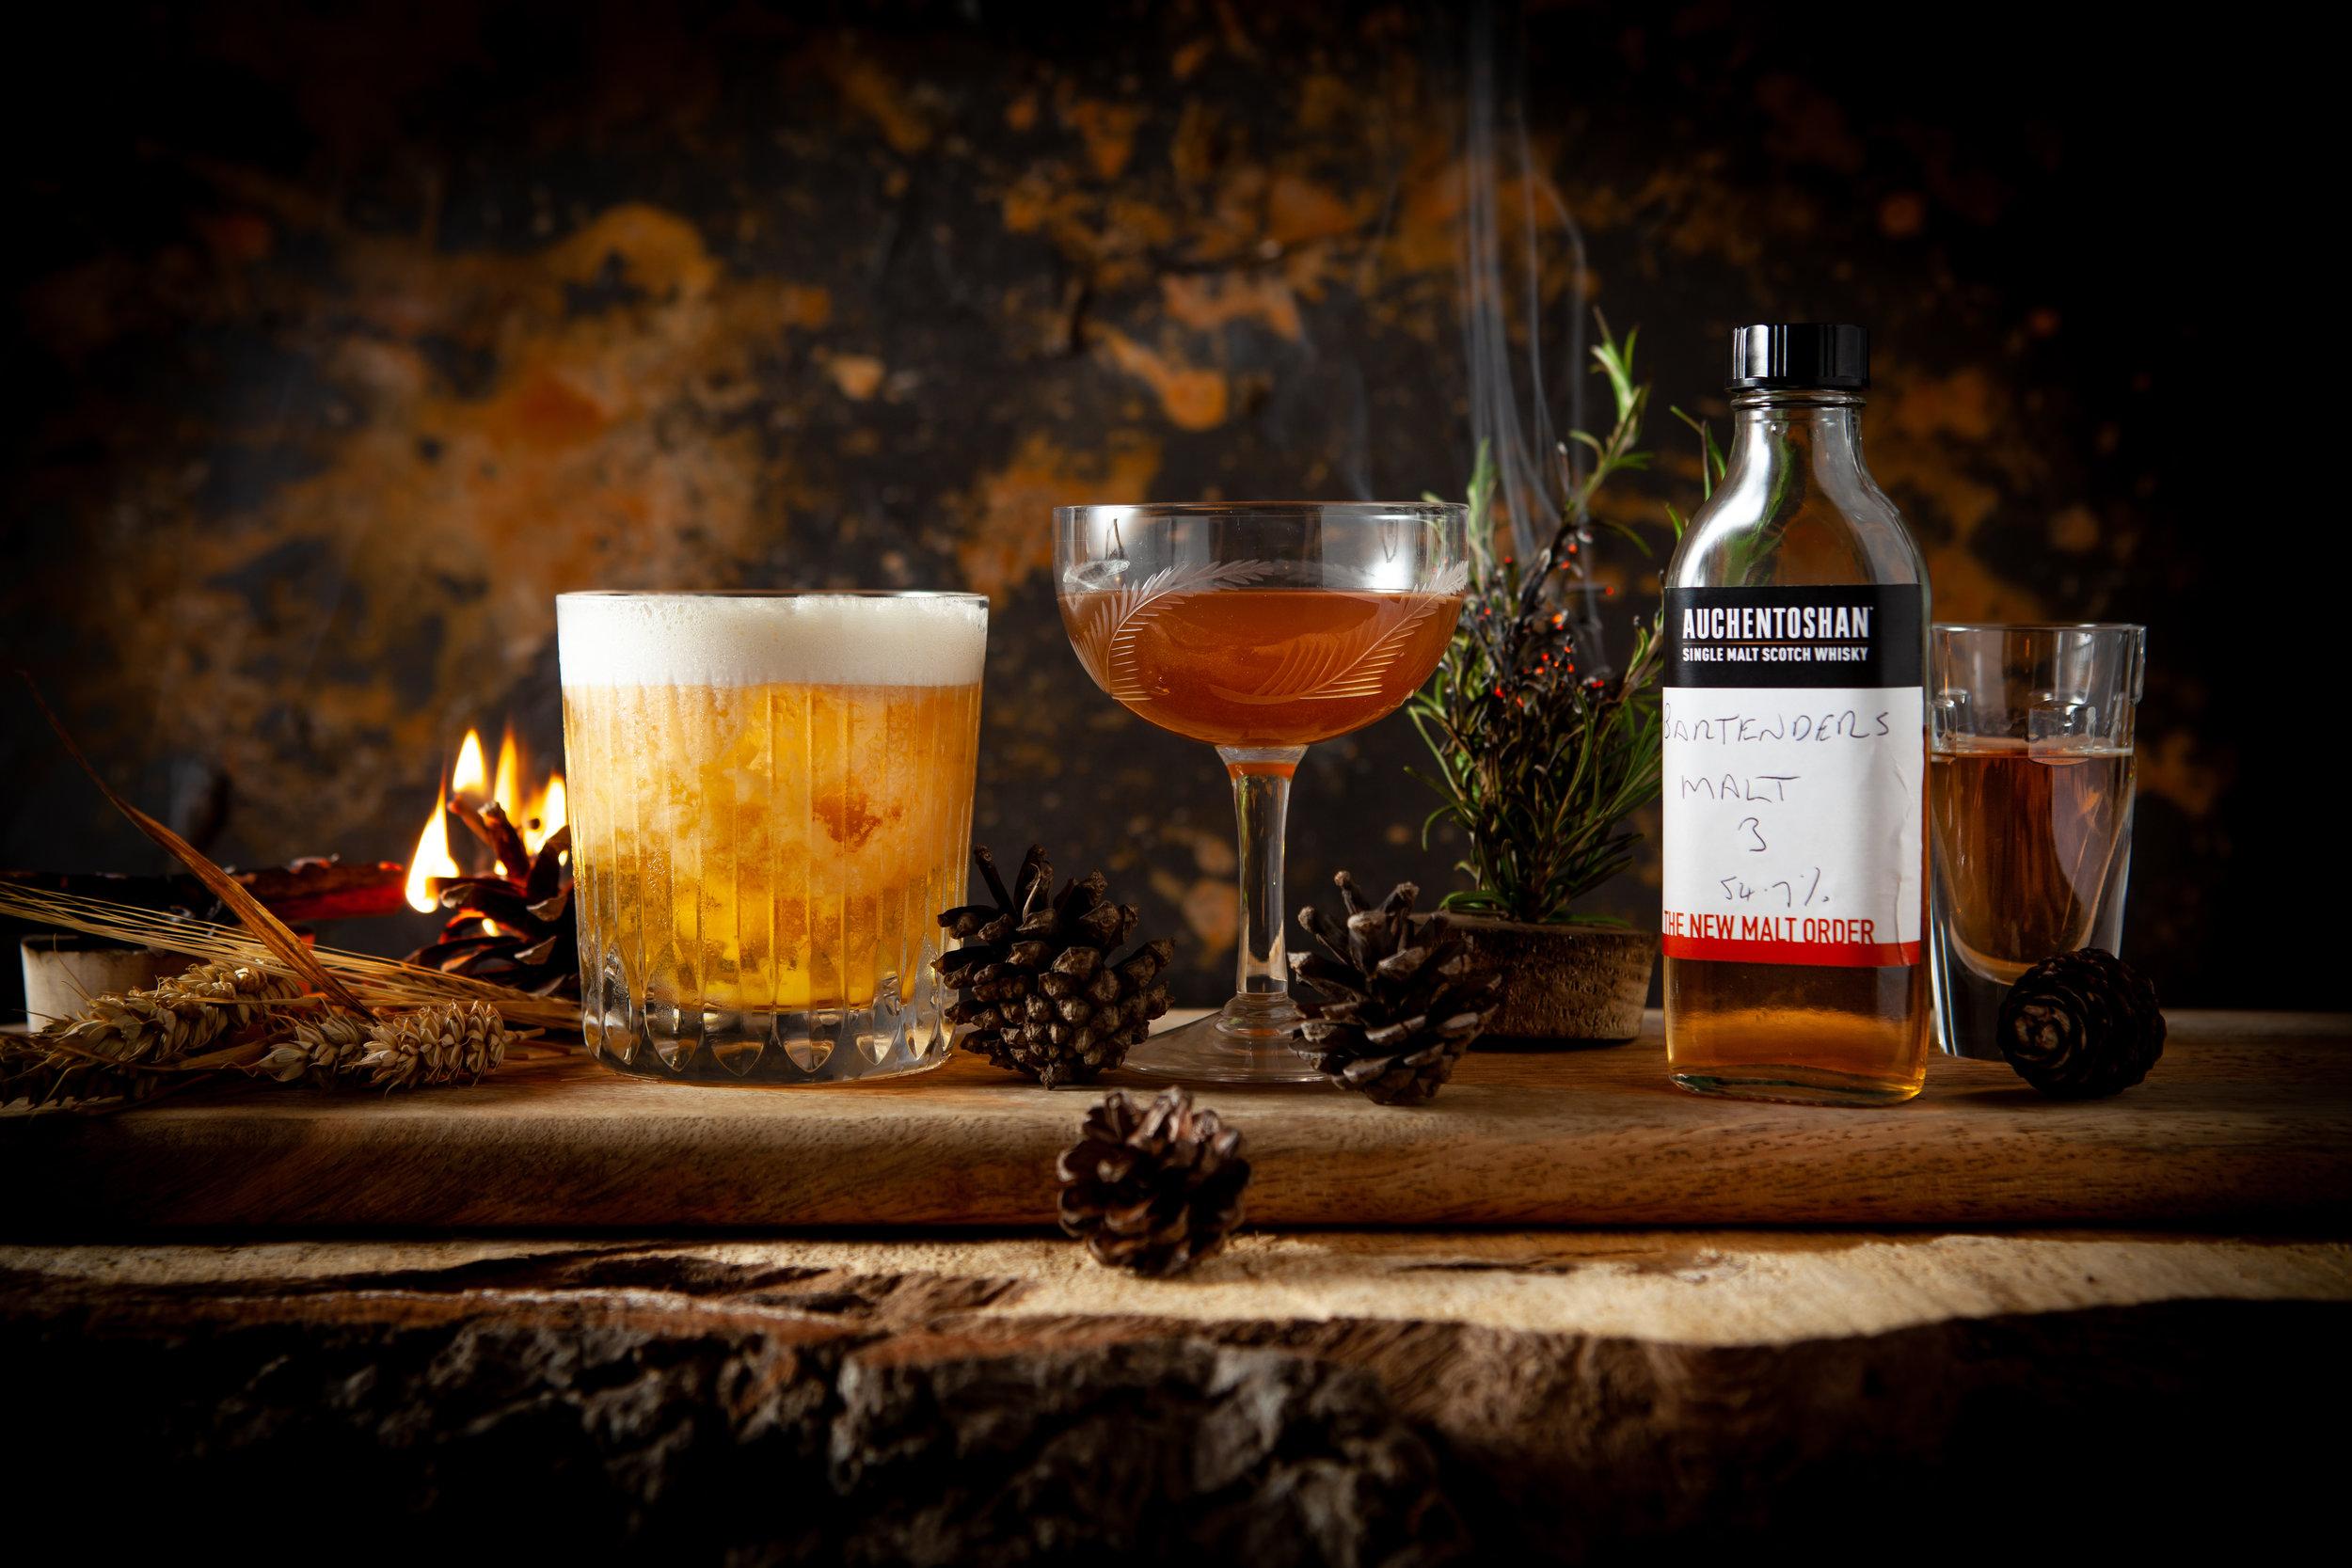 whisky photography, drinks photography glasgow, edinburgh, scotland